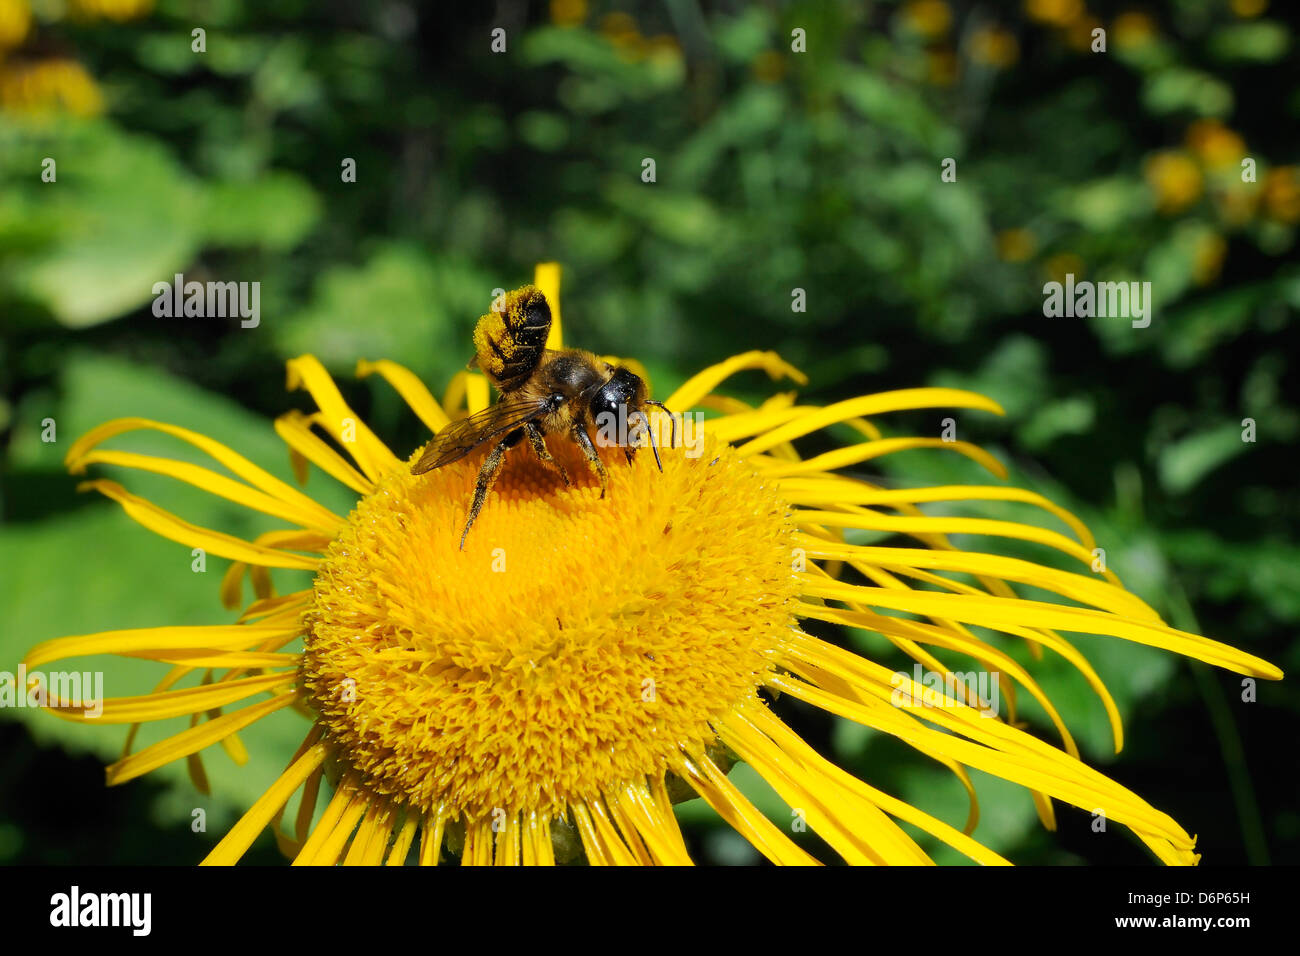 Leafcutter bee (Megachile sp.) feeding from flowerhead of heartleaf oxeye (giant oxeye daisy) (Telekia speciosa), - Stock Image